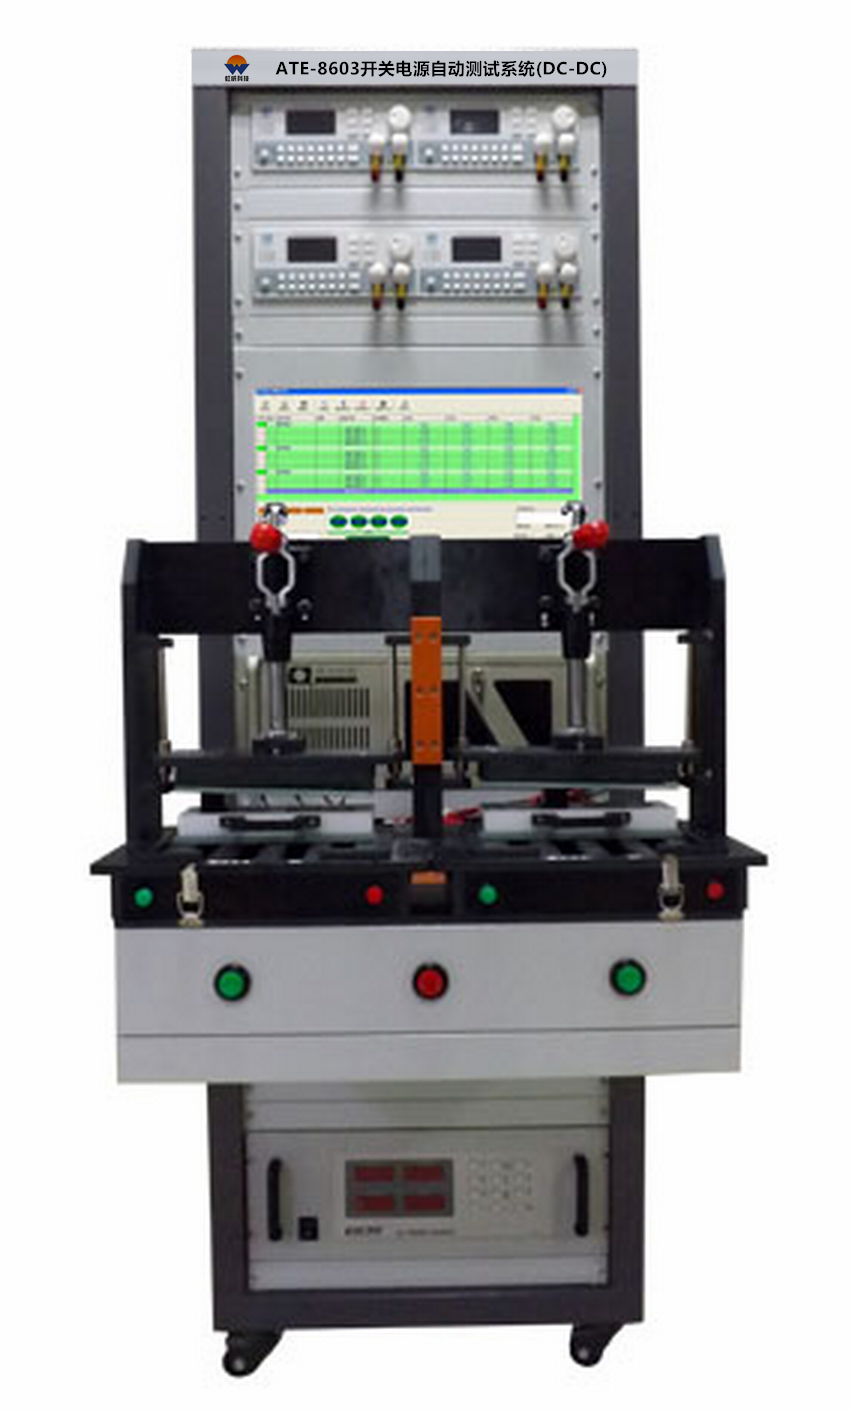 ATE-8603开关电源自动测试系统(DC-DC)